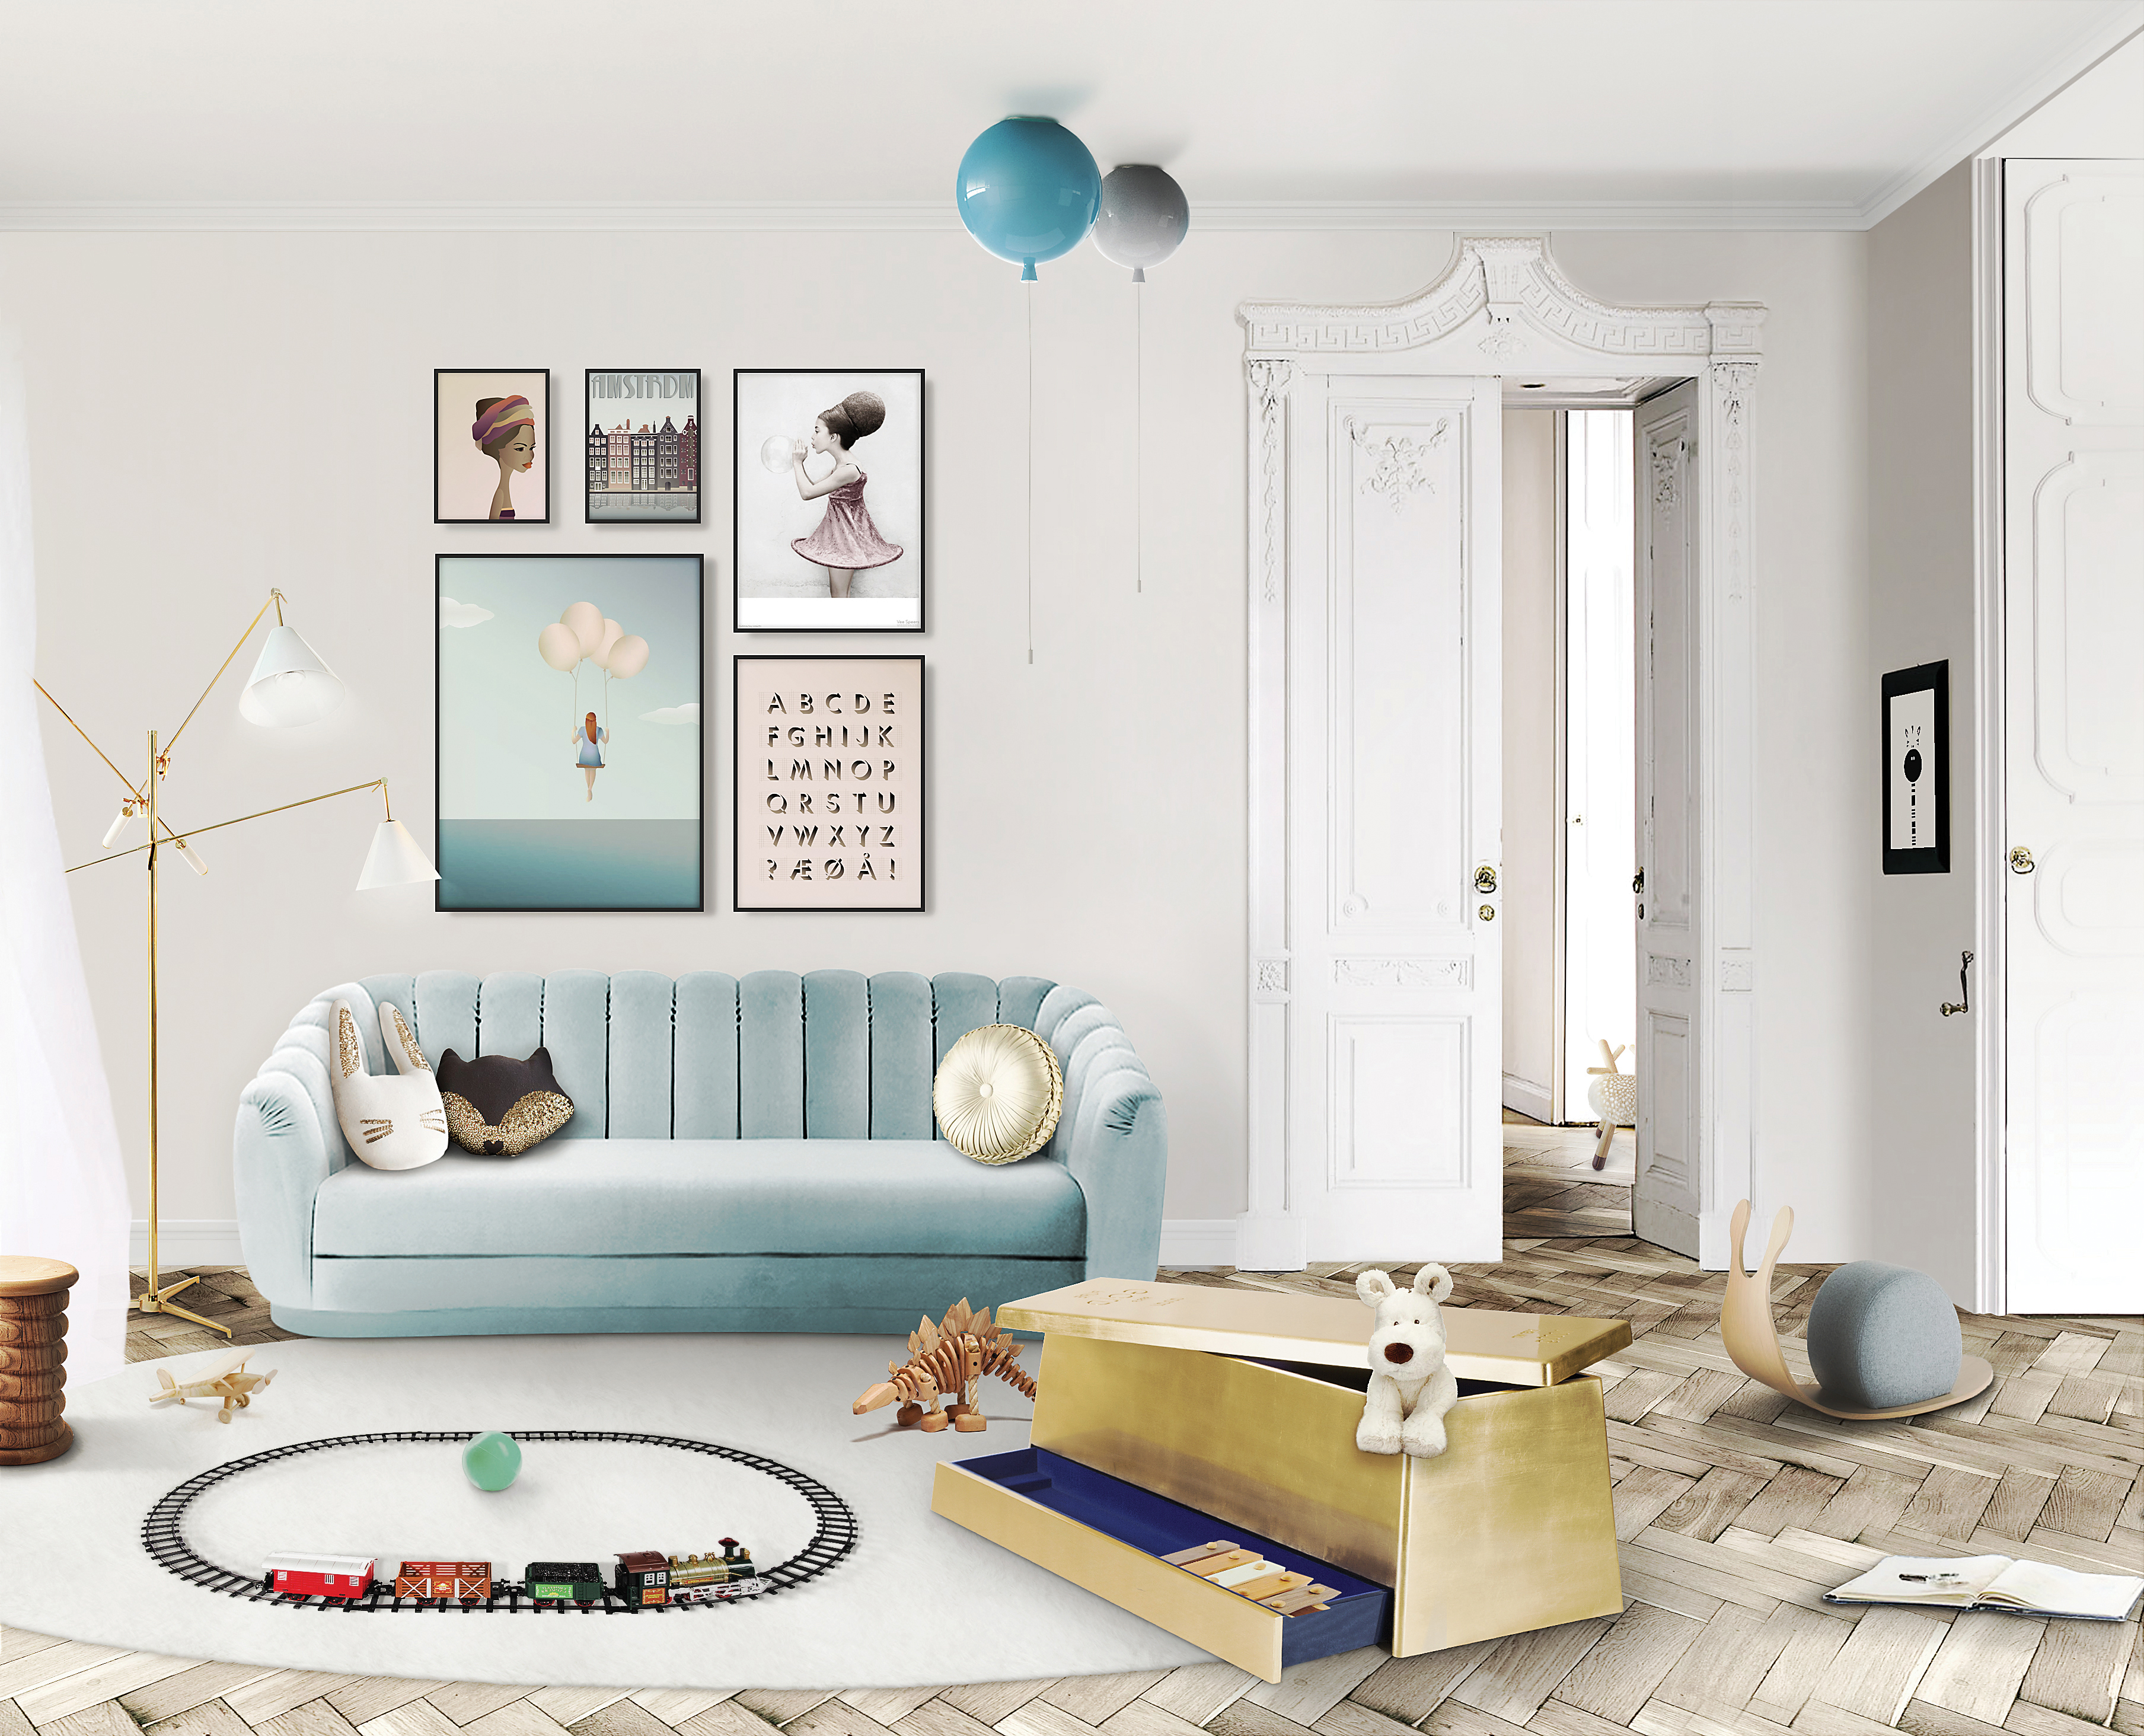 Top 5 Furniture Brands at Maison et Objet 2017 furniture brands Top 5 Furniture Brands at Maison et Objet 2017 gold box ambiente